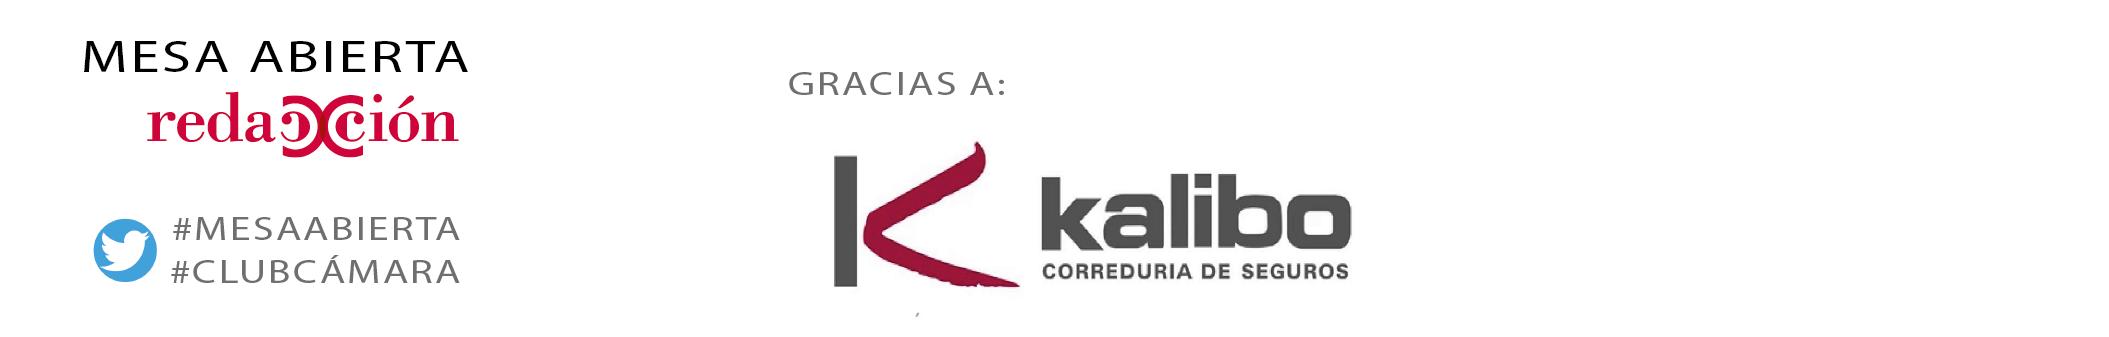 Kalibo (4)